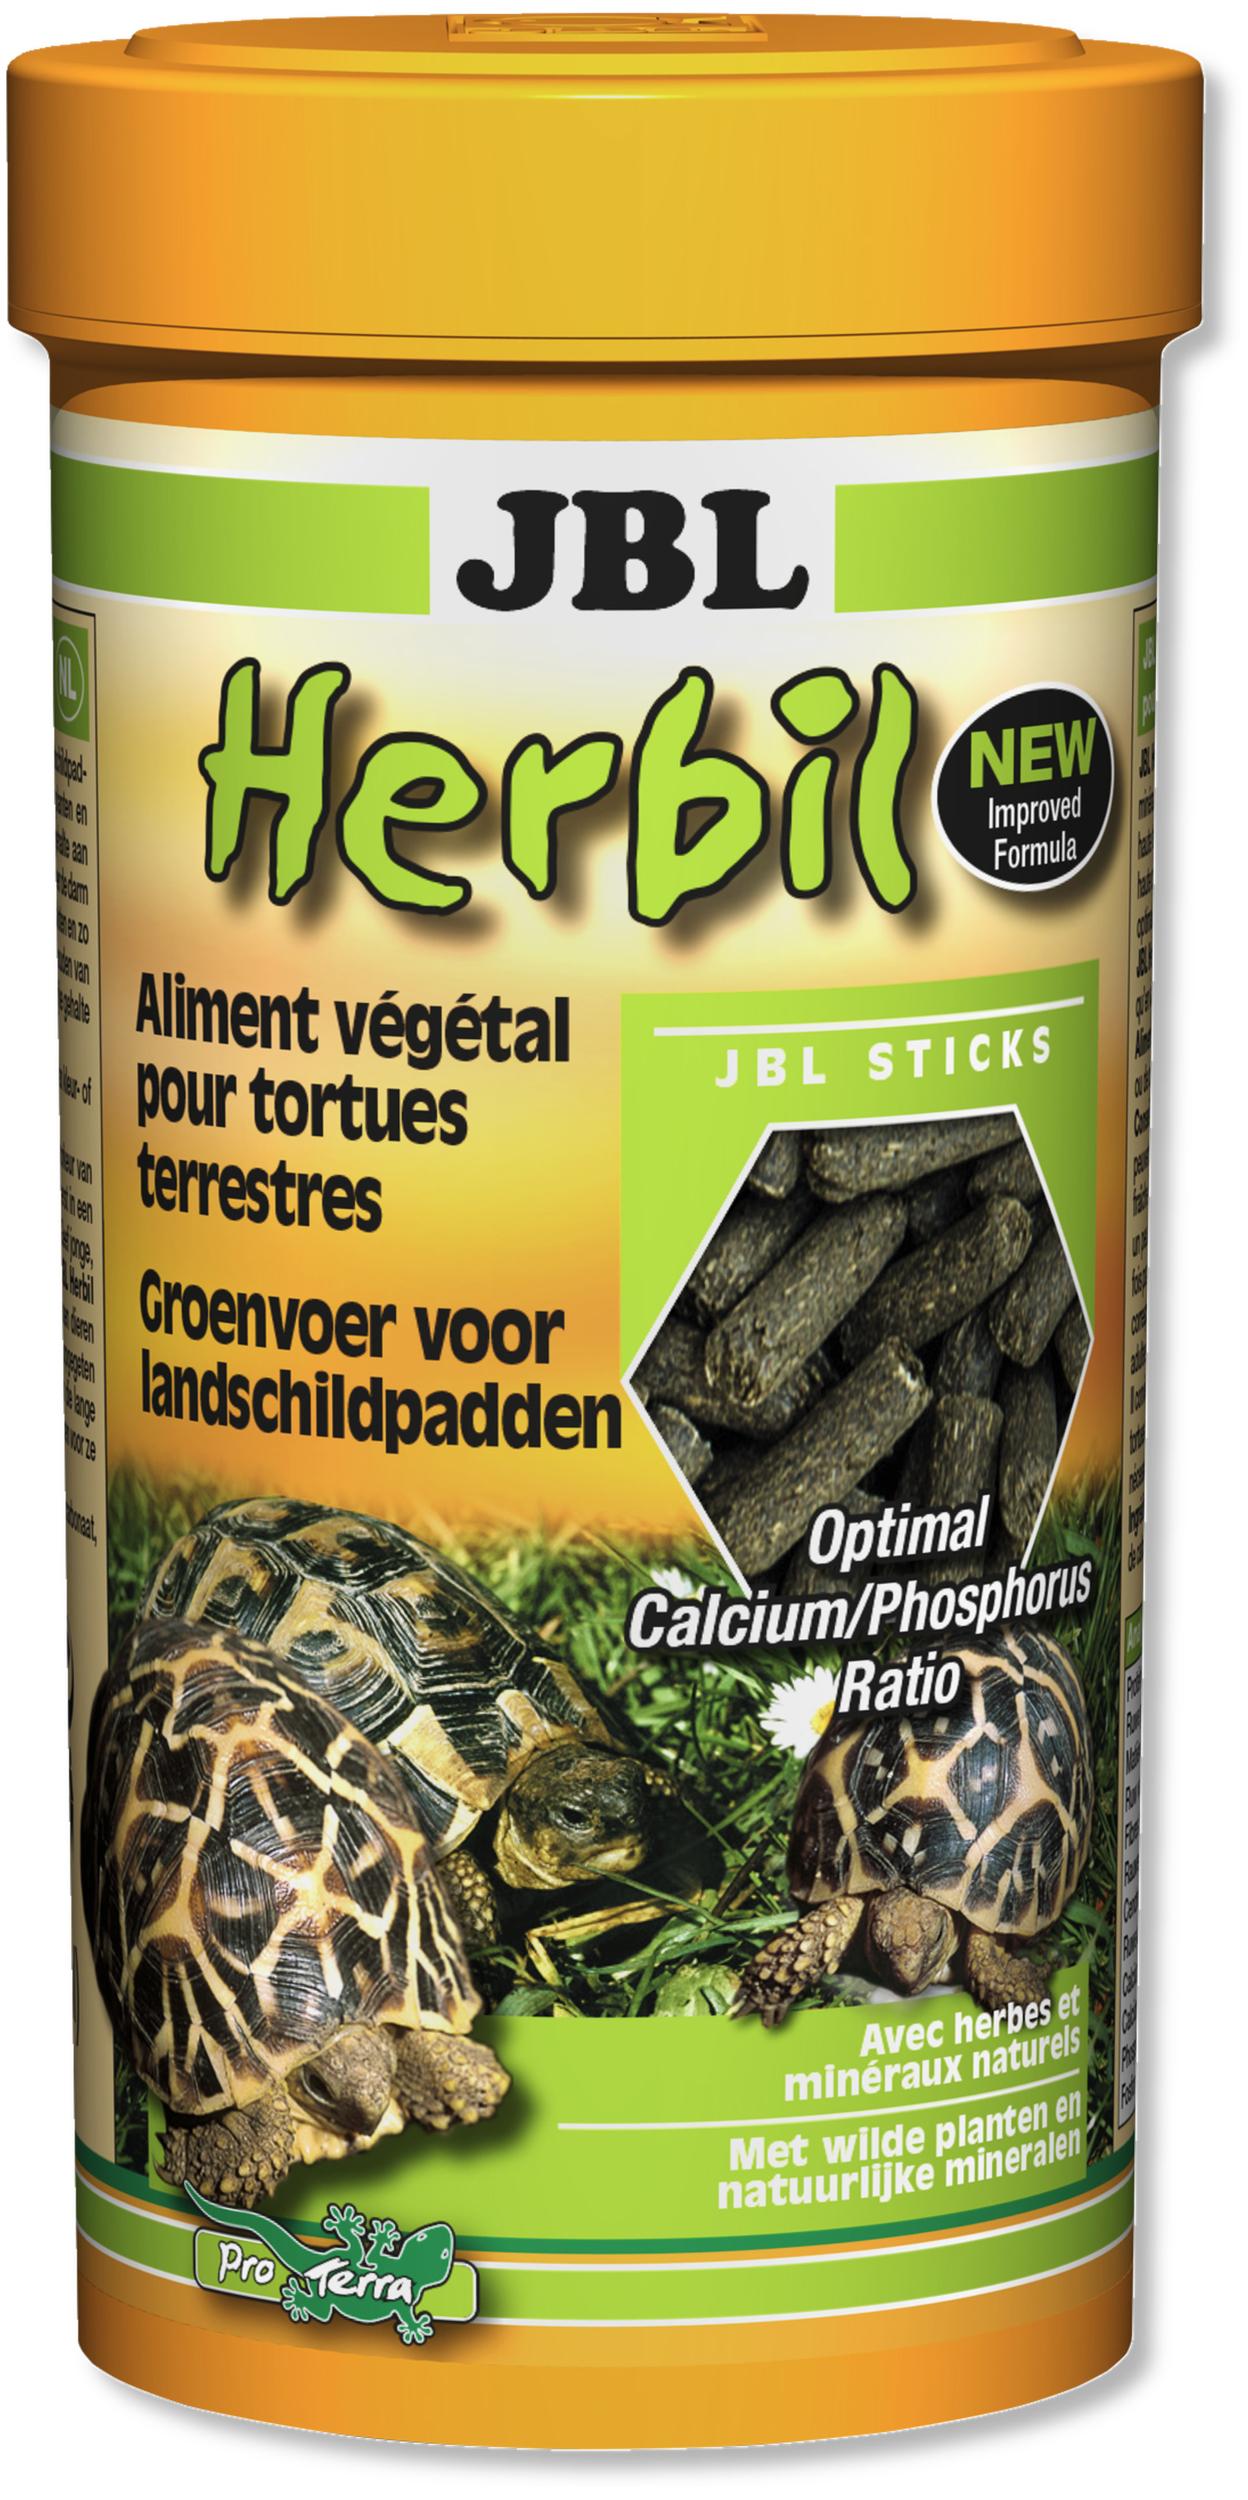 jbl-herbil-250-ml-nourriture-pour-torture-de-terre